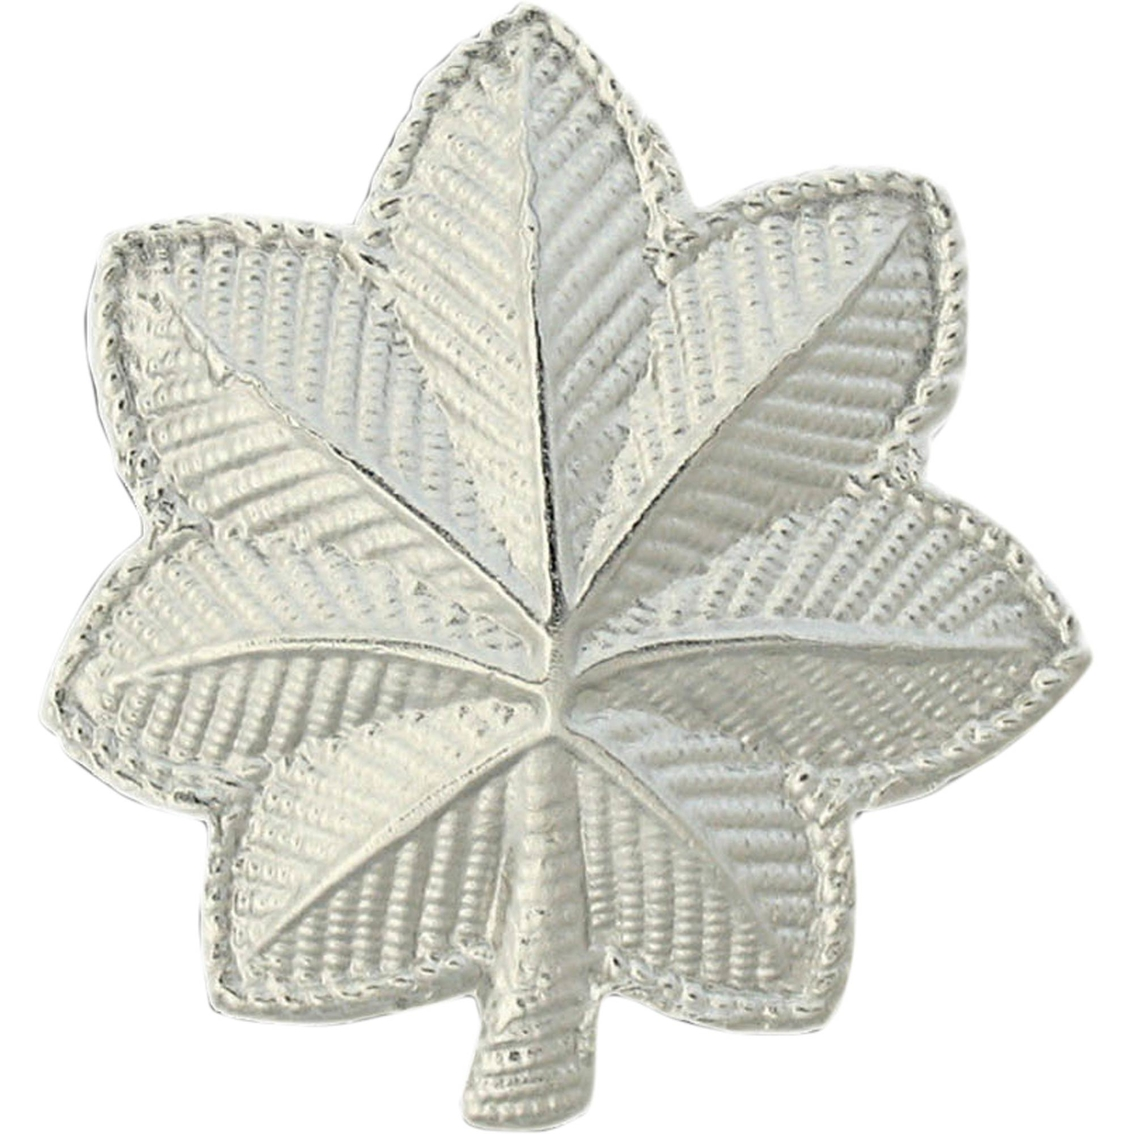 Air Force Lieutenant Colonel Lt Col Specification Rank Regular